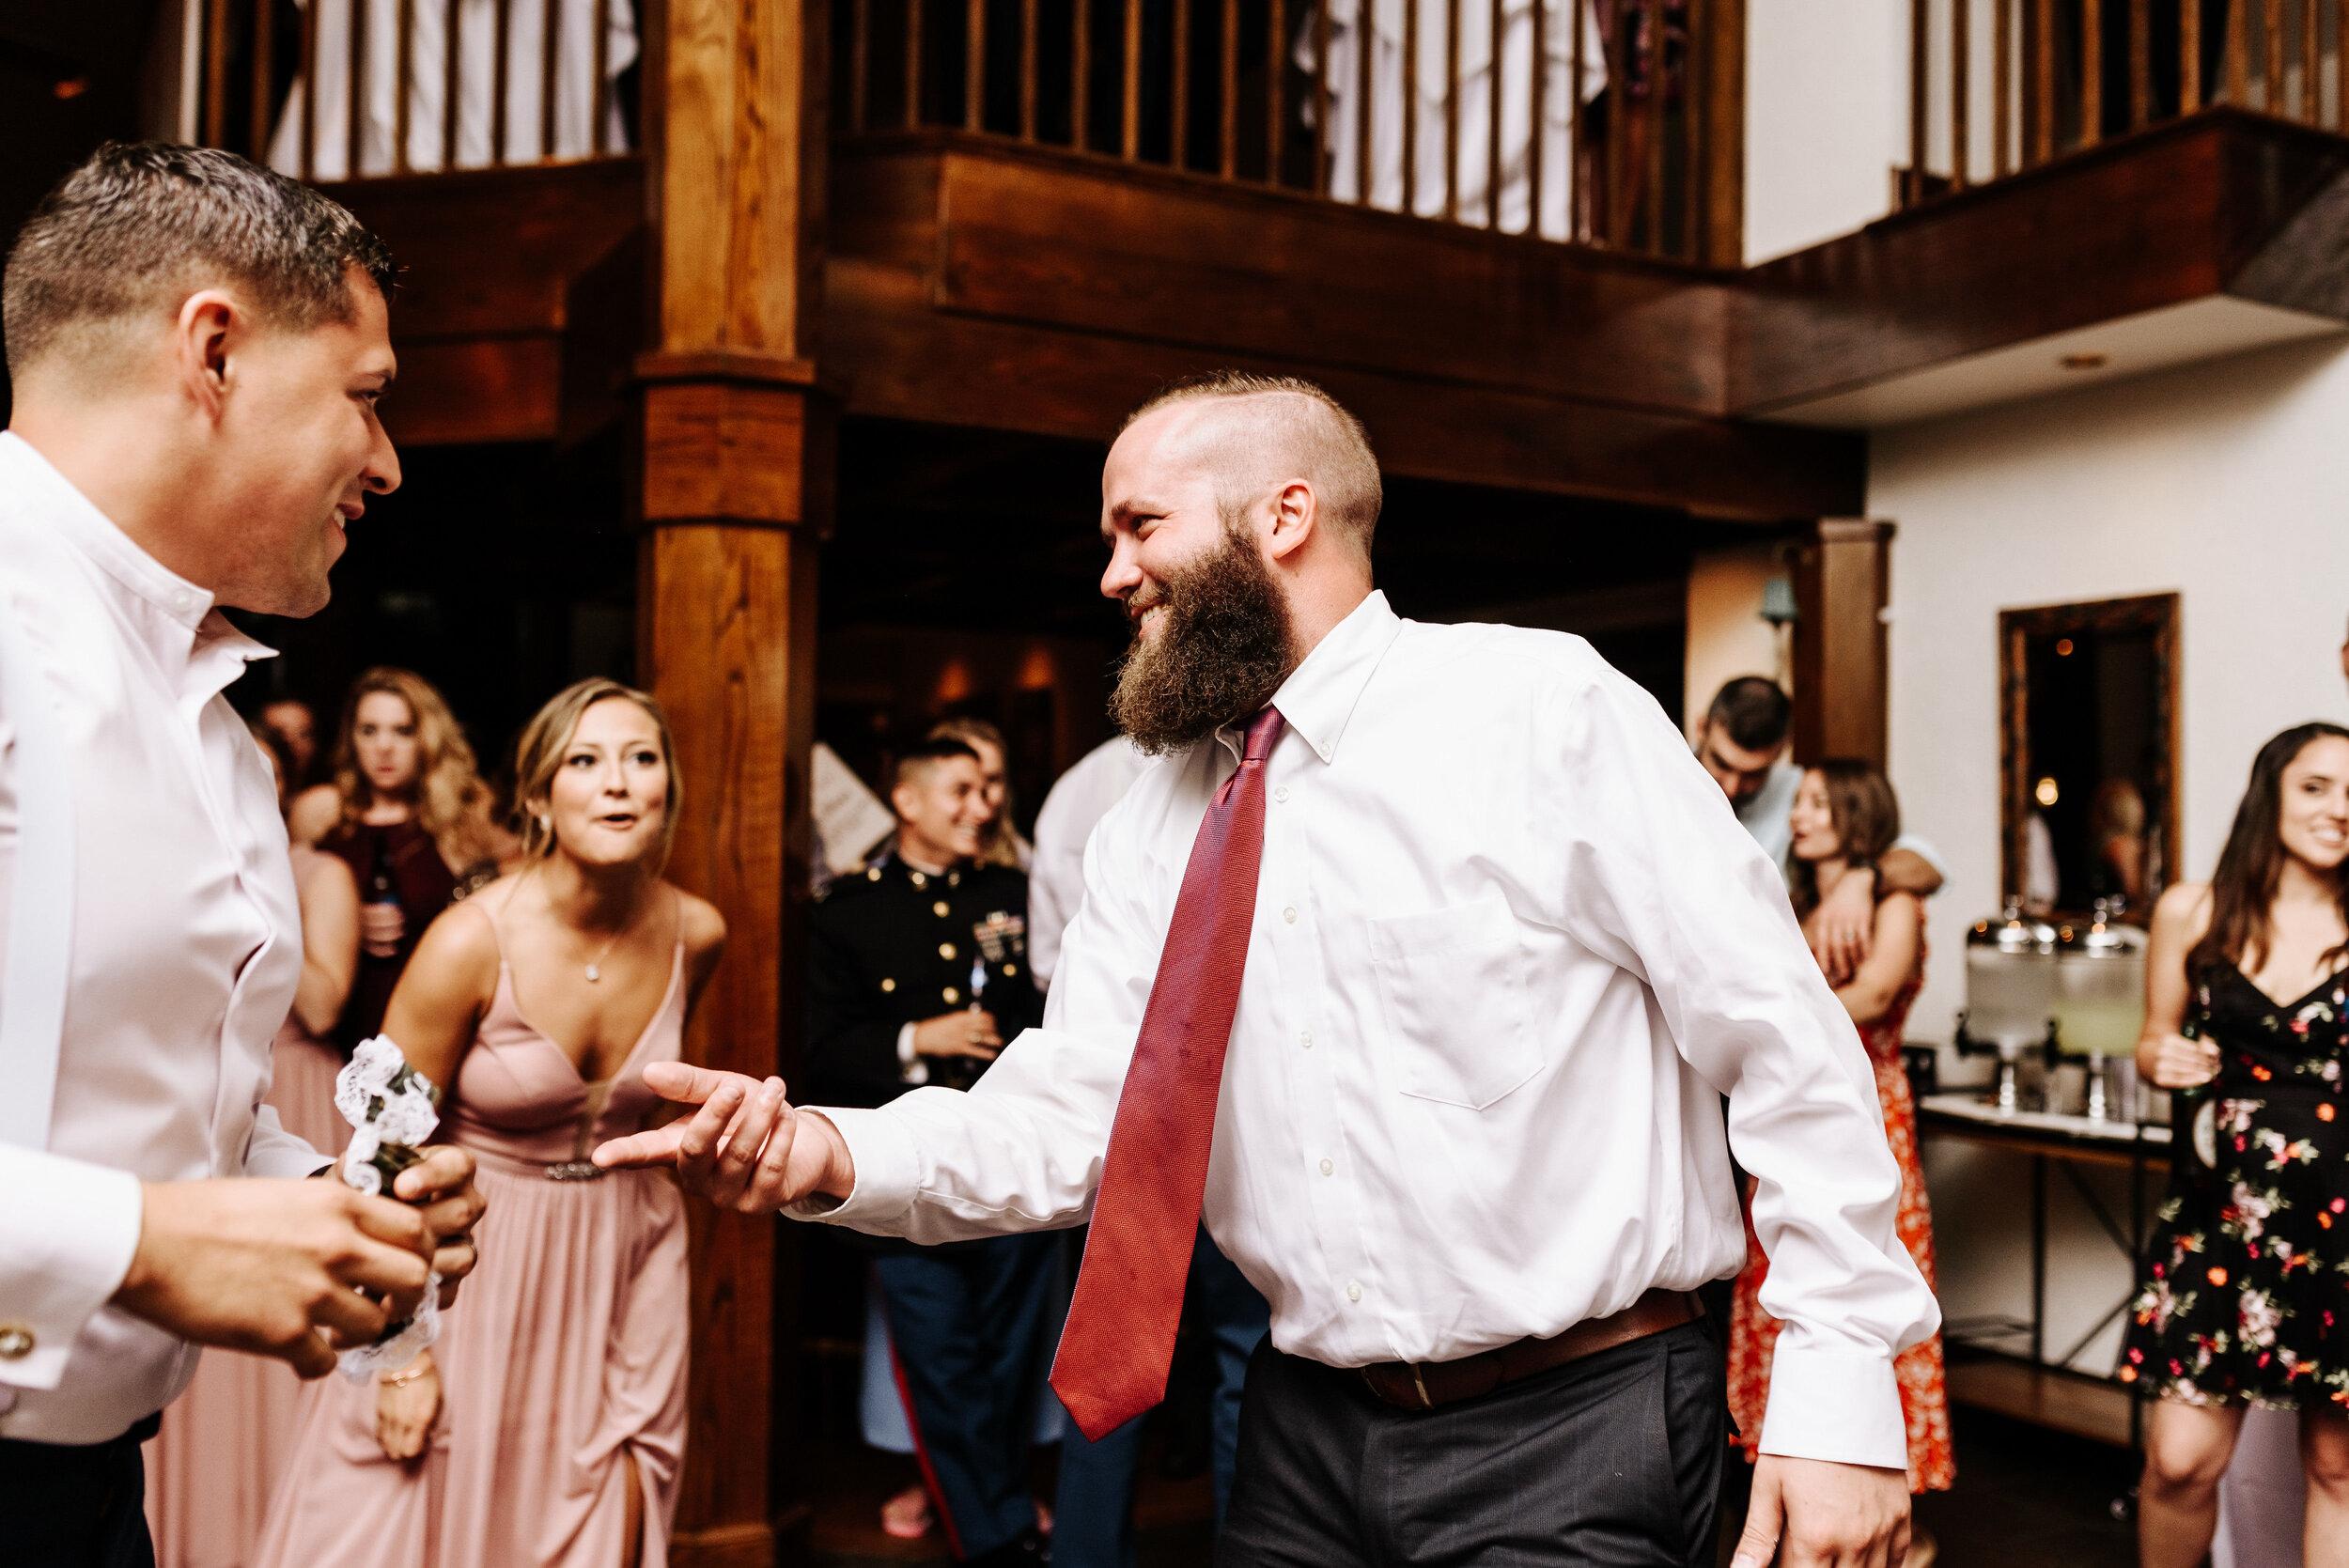 Emily_Mike_Wedding_Celebrations_at_the_Reservoir_Pool_Pavilion_Richmond_Virginia_Wedding_Photographer_Photography_by_V_114.jpg